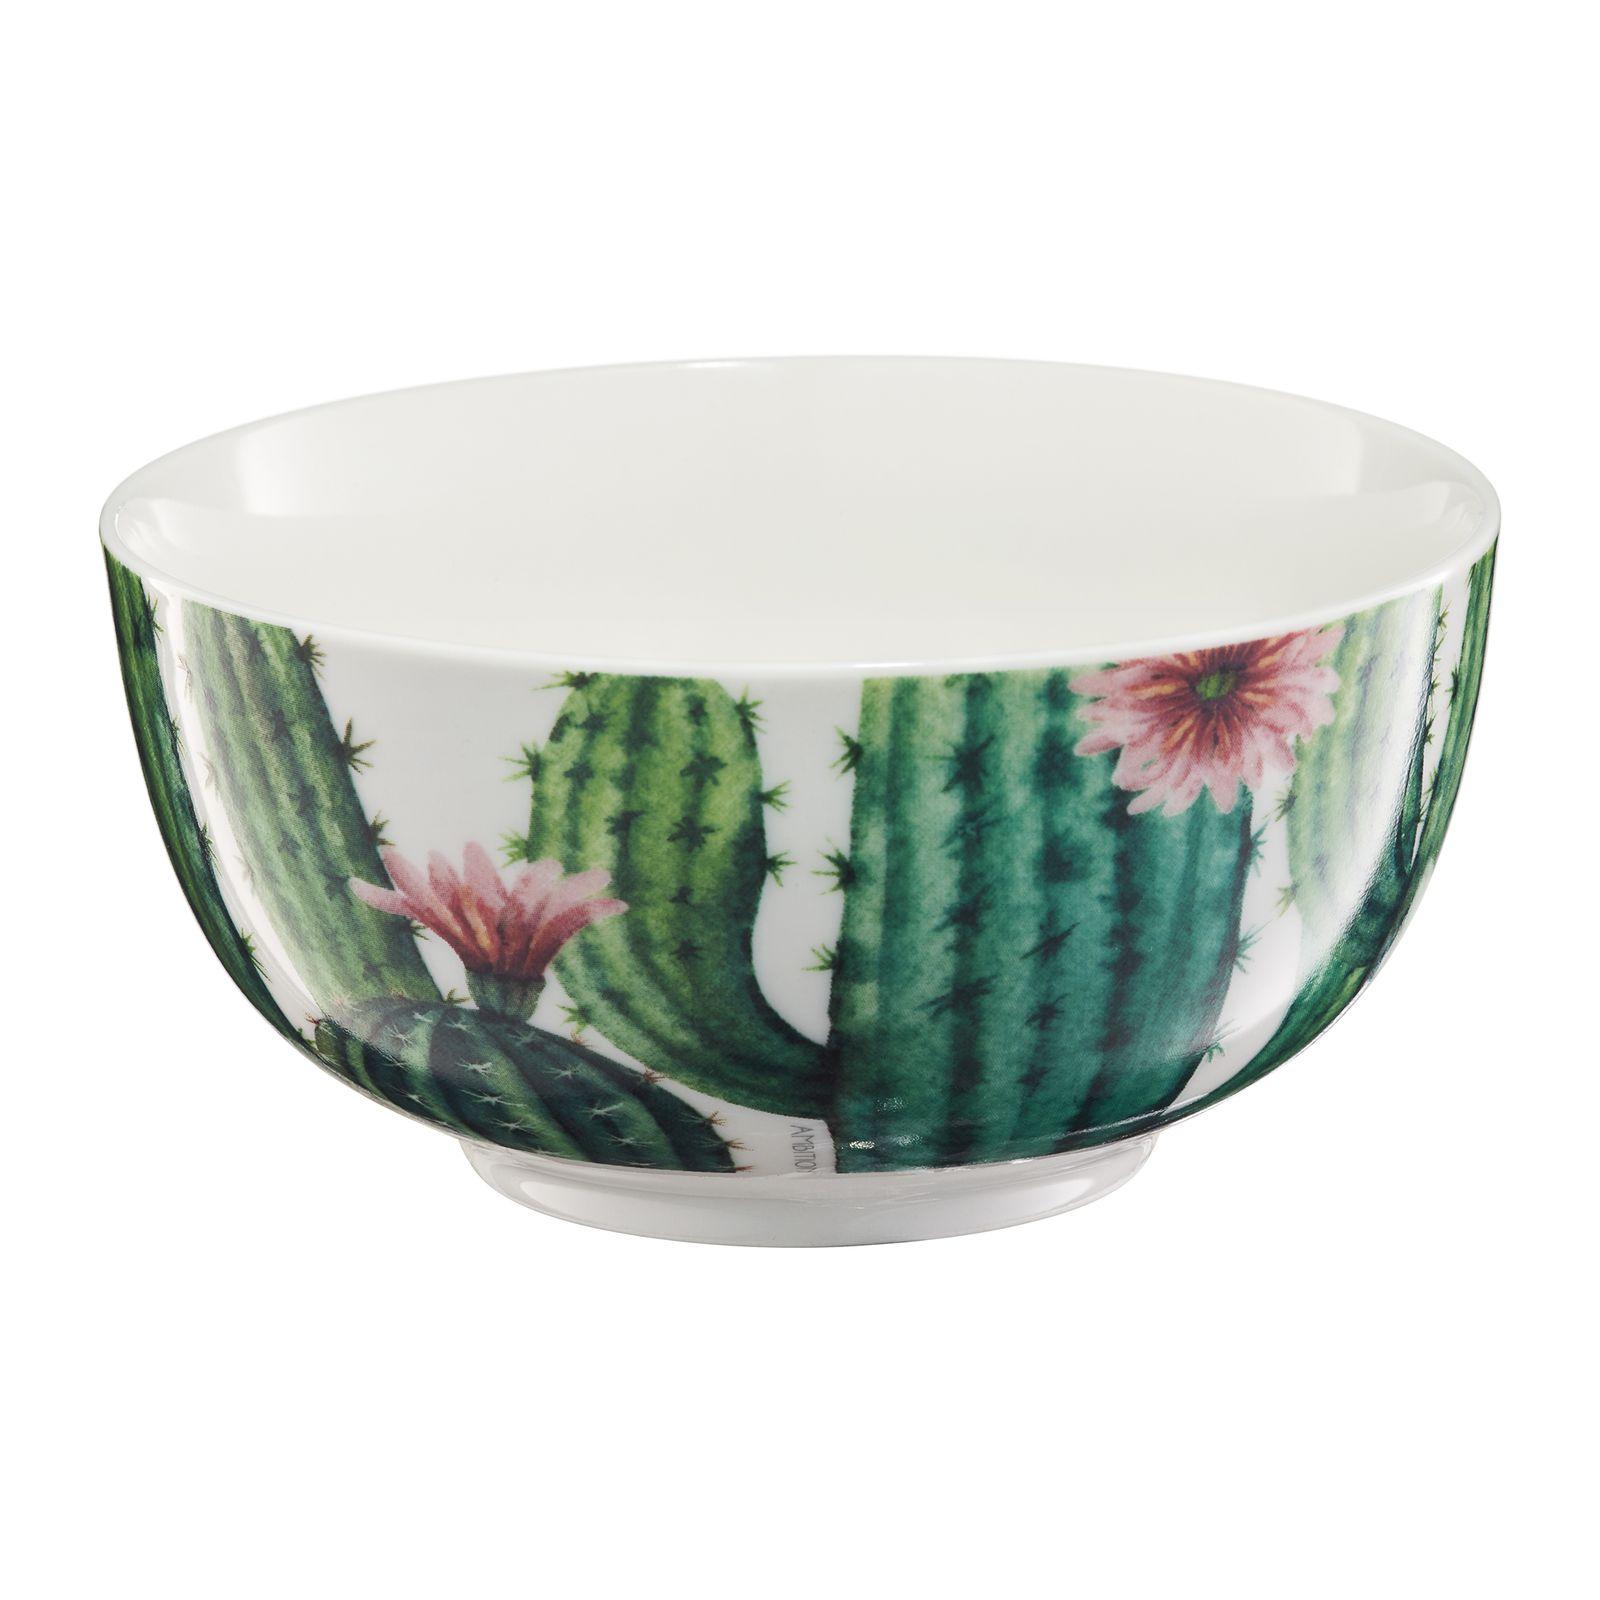 Salaterka Cactus 13 cm kaktus AMBITION